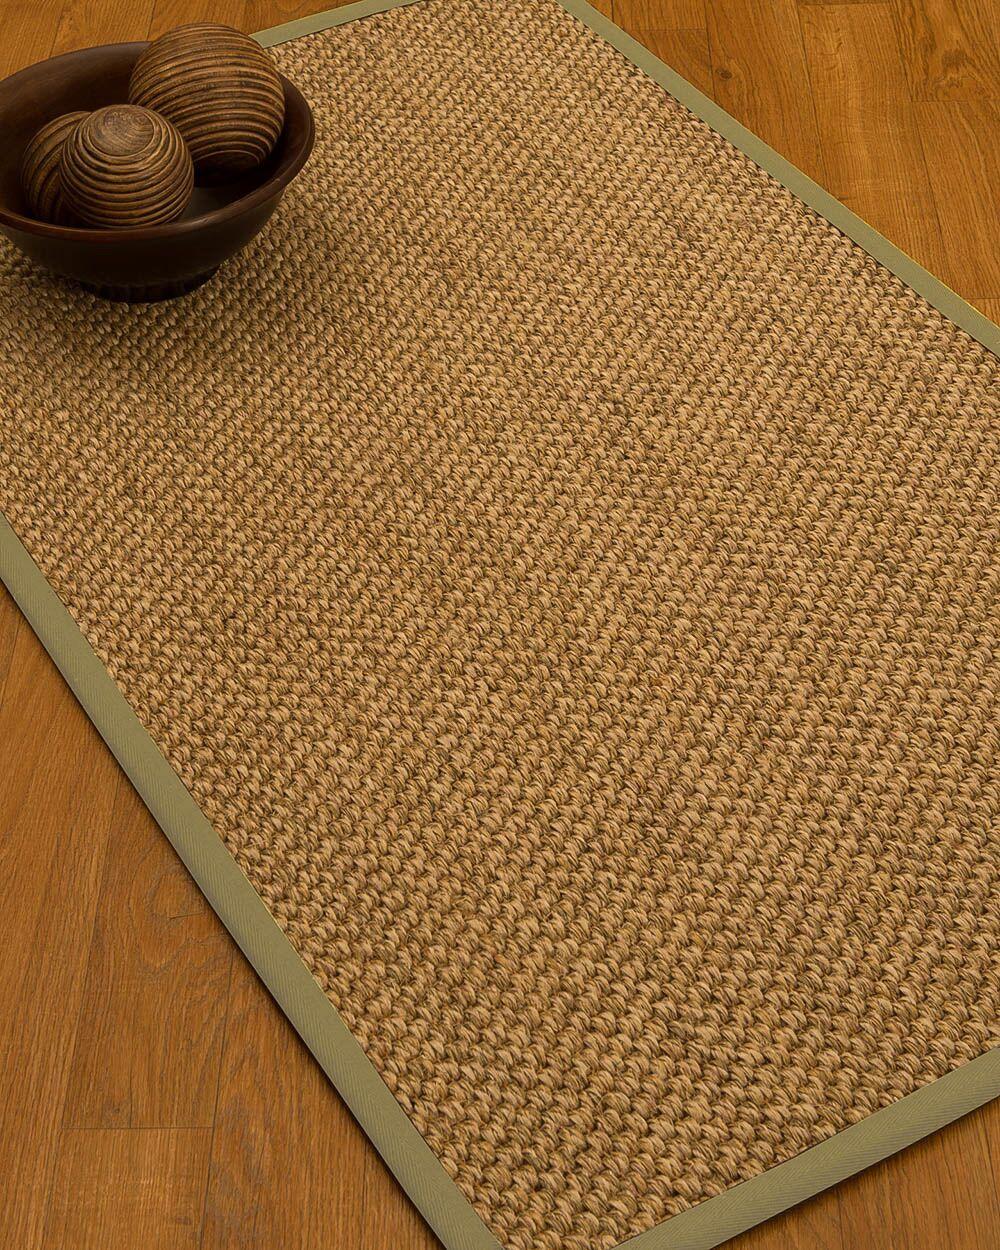 Heier Border Hand-Woven Brown/Sand Area Rug Rug Pad Included: No, Rug Size: Rectangle 3' x 5'